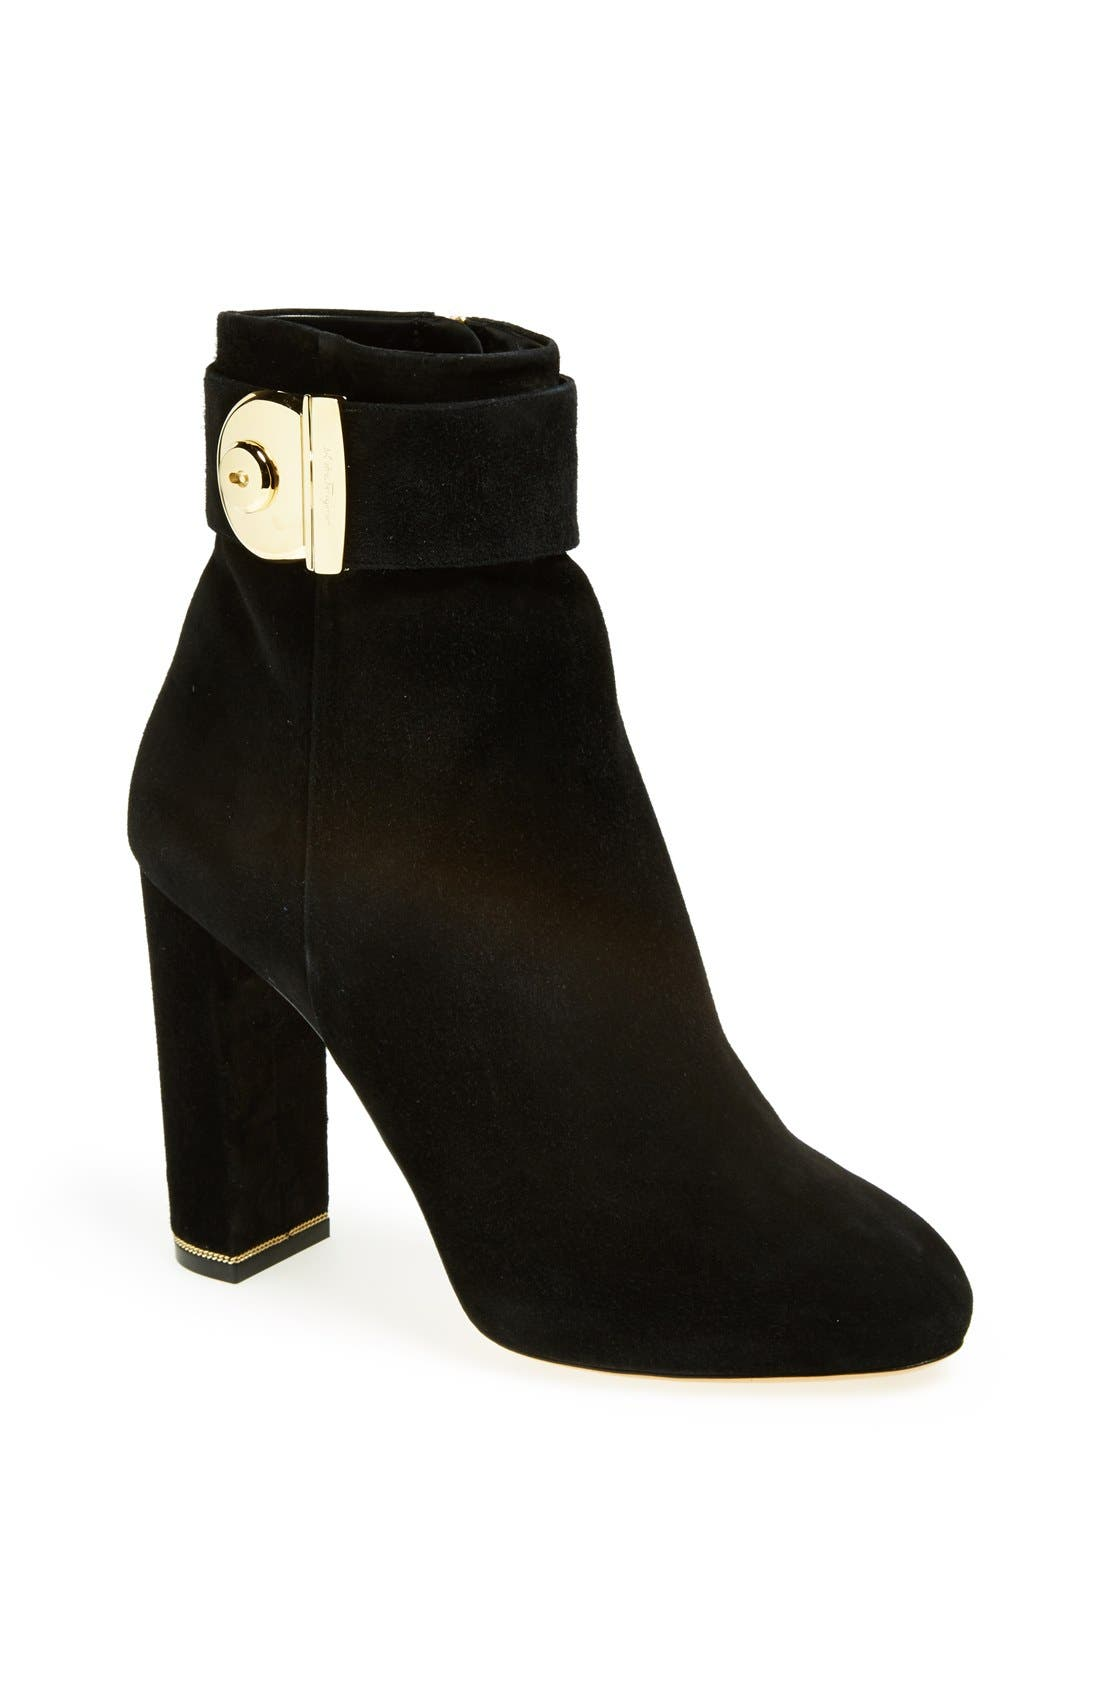 Alternate Image 1 Selected - Salvatore Ferragamo 'Negus' Ankle Boot